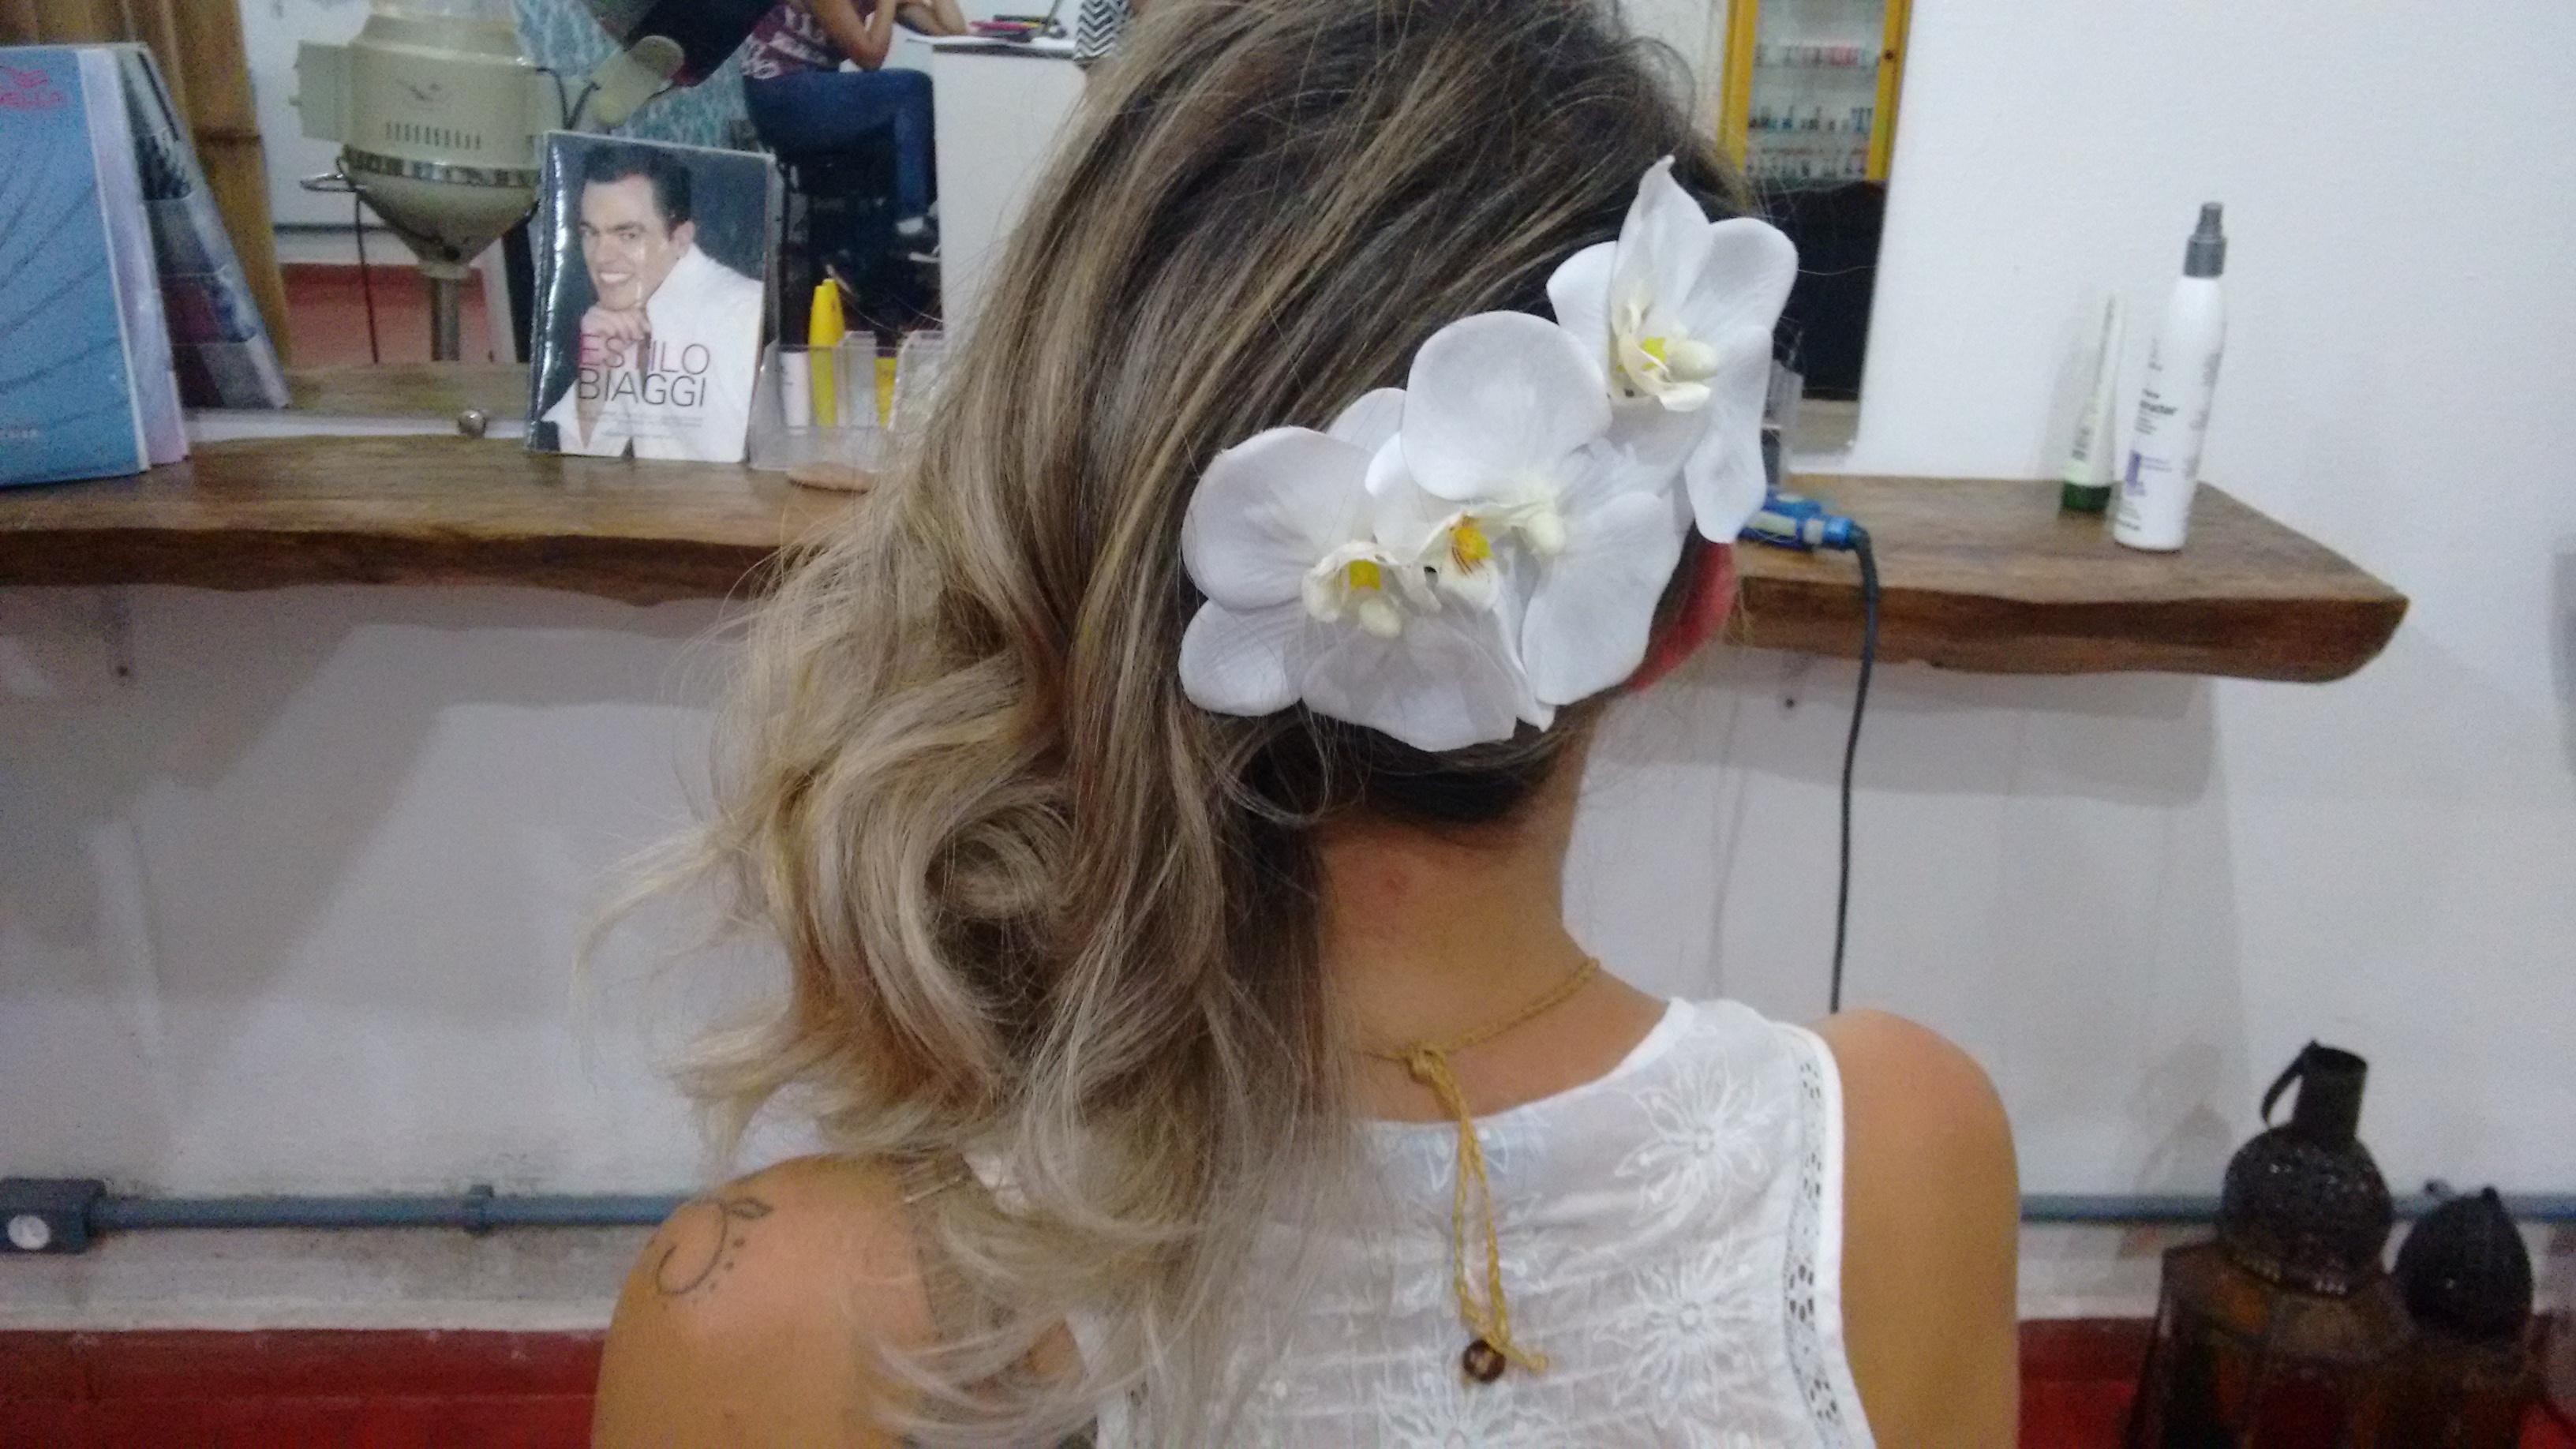 #noivasnapraia #casamentopenaareia #litoralnortesp #beachwedding cabeleireiro(a) maquiador(a)